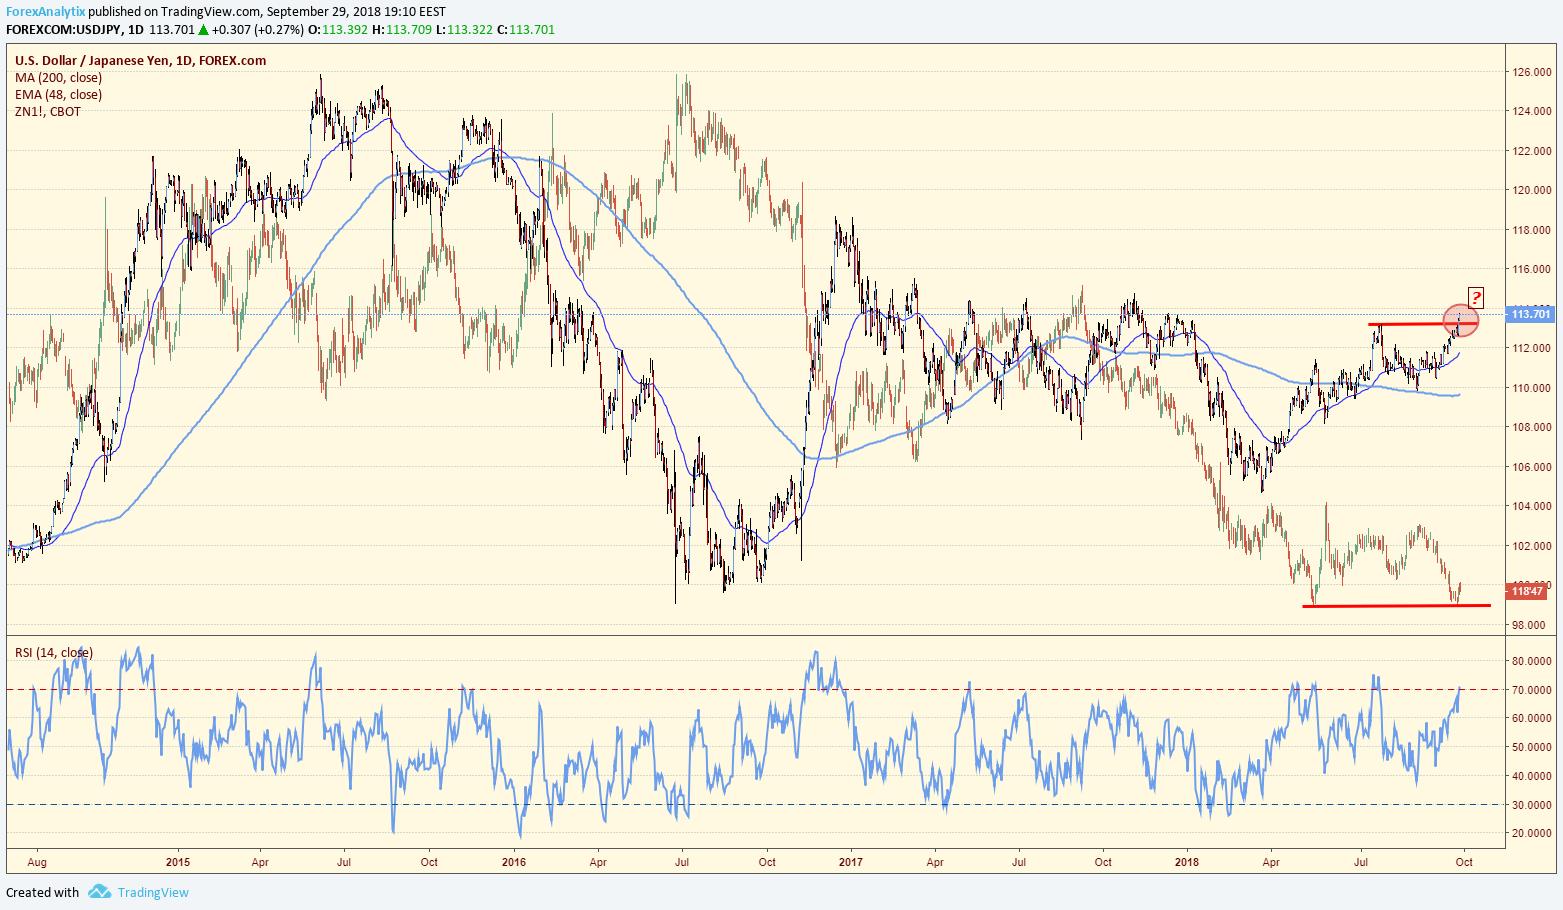 JPY - Treasuries Correlation